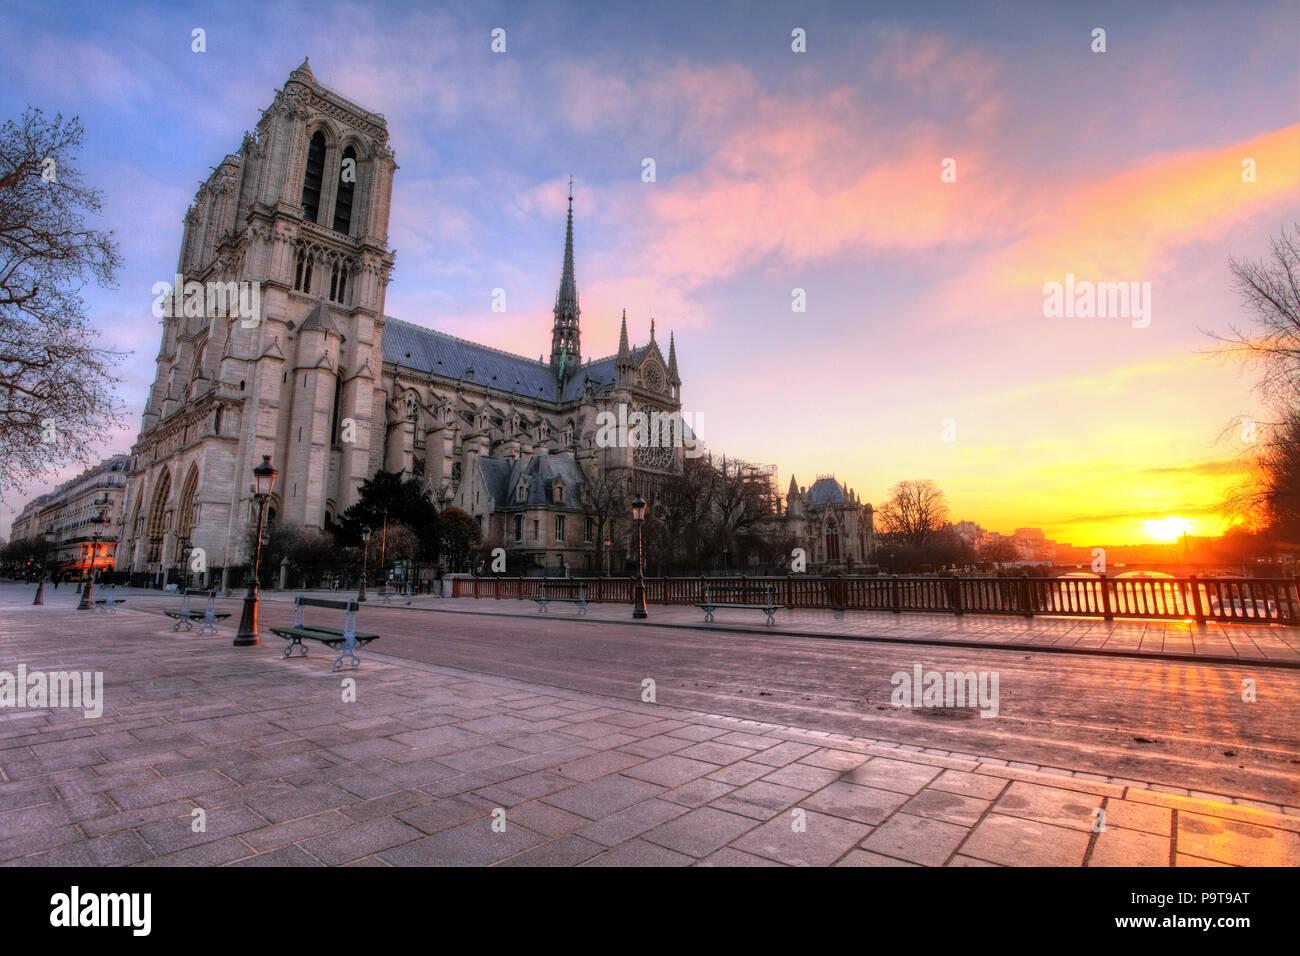 Paris - Notre Dame at sunrise, France - Stock Image